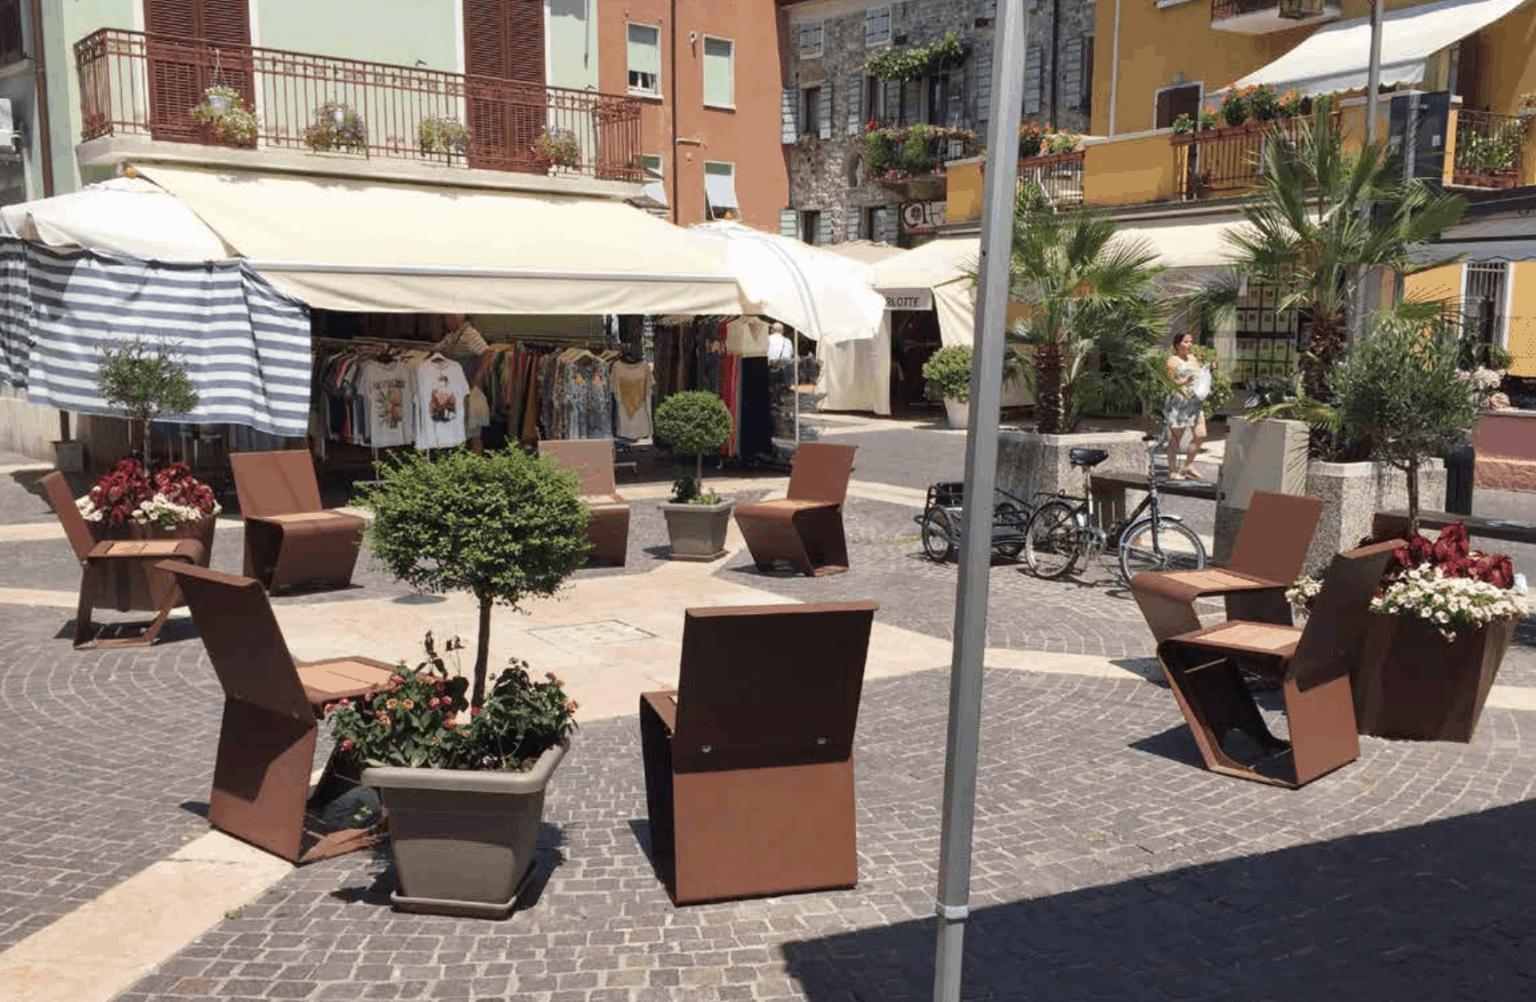 streetscape-furnishings_49643246708_o-1536x1002